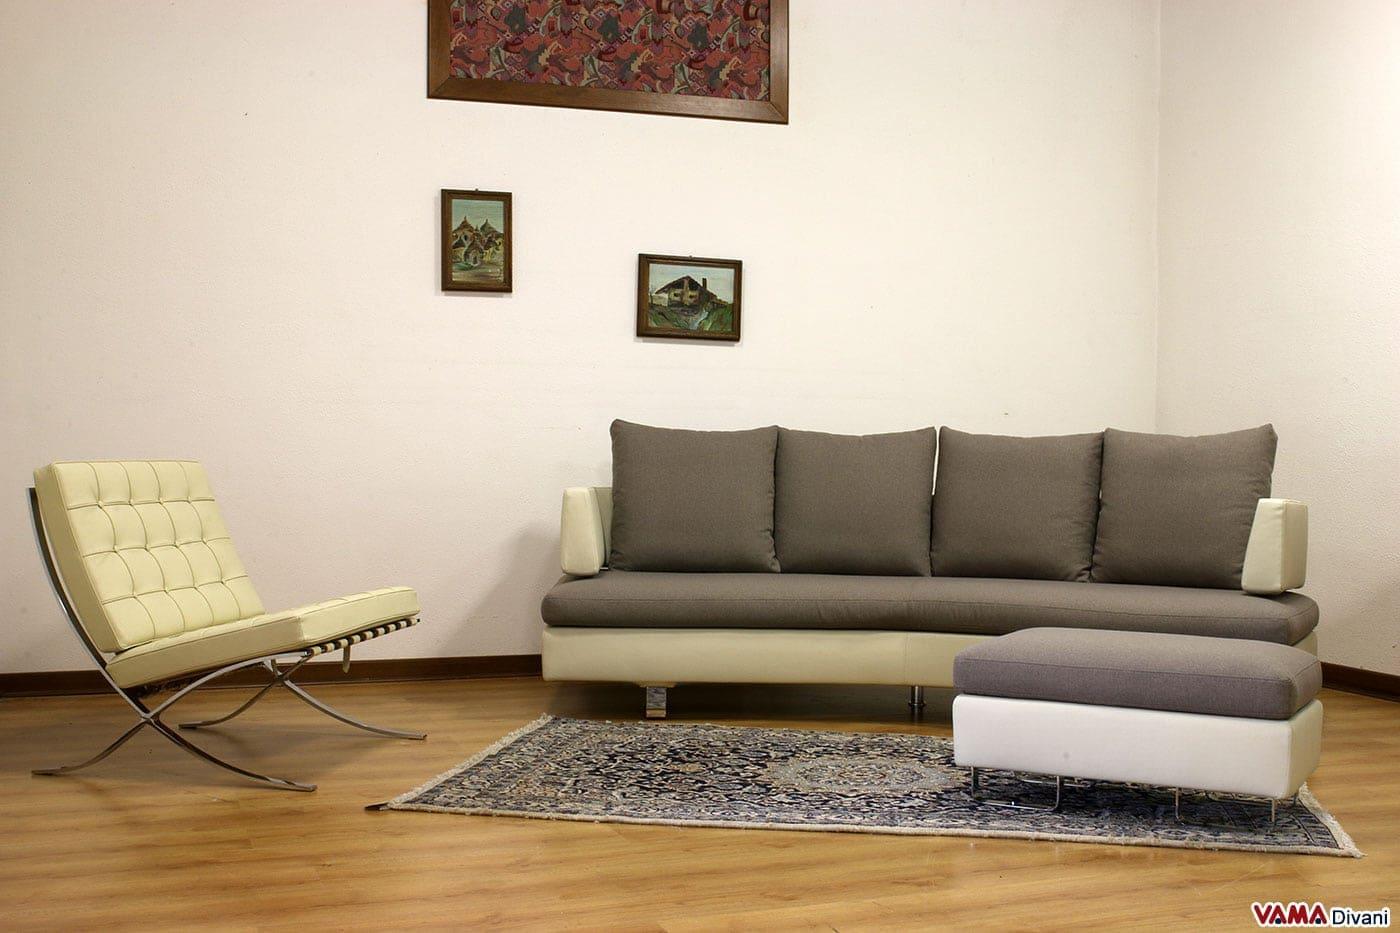 Poltrona barcelona vama divani